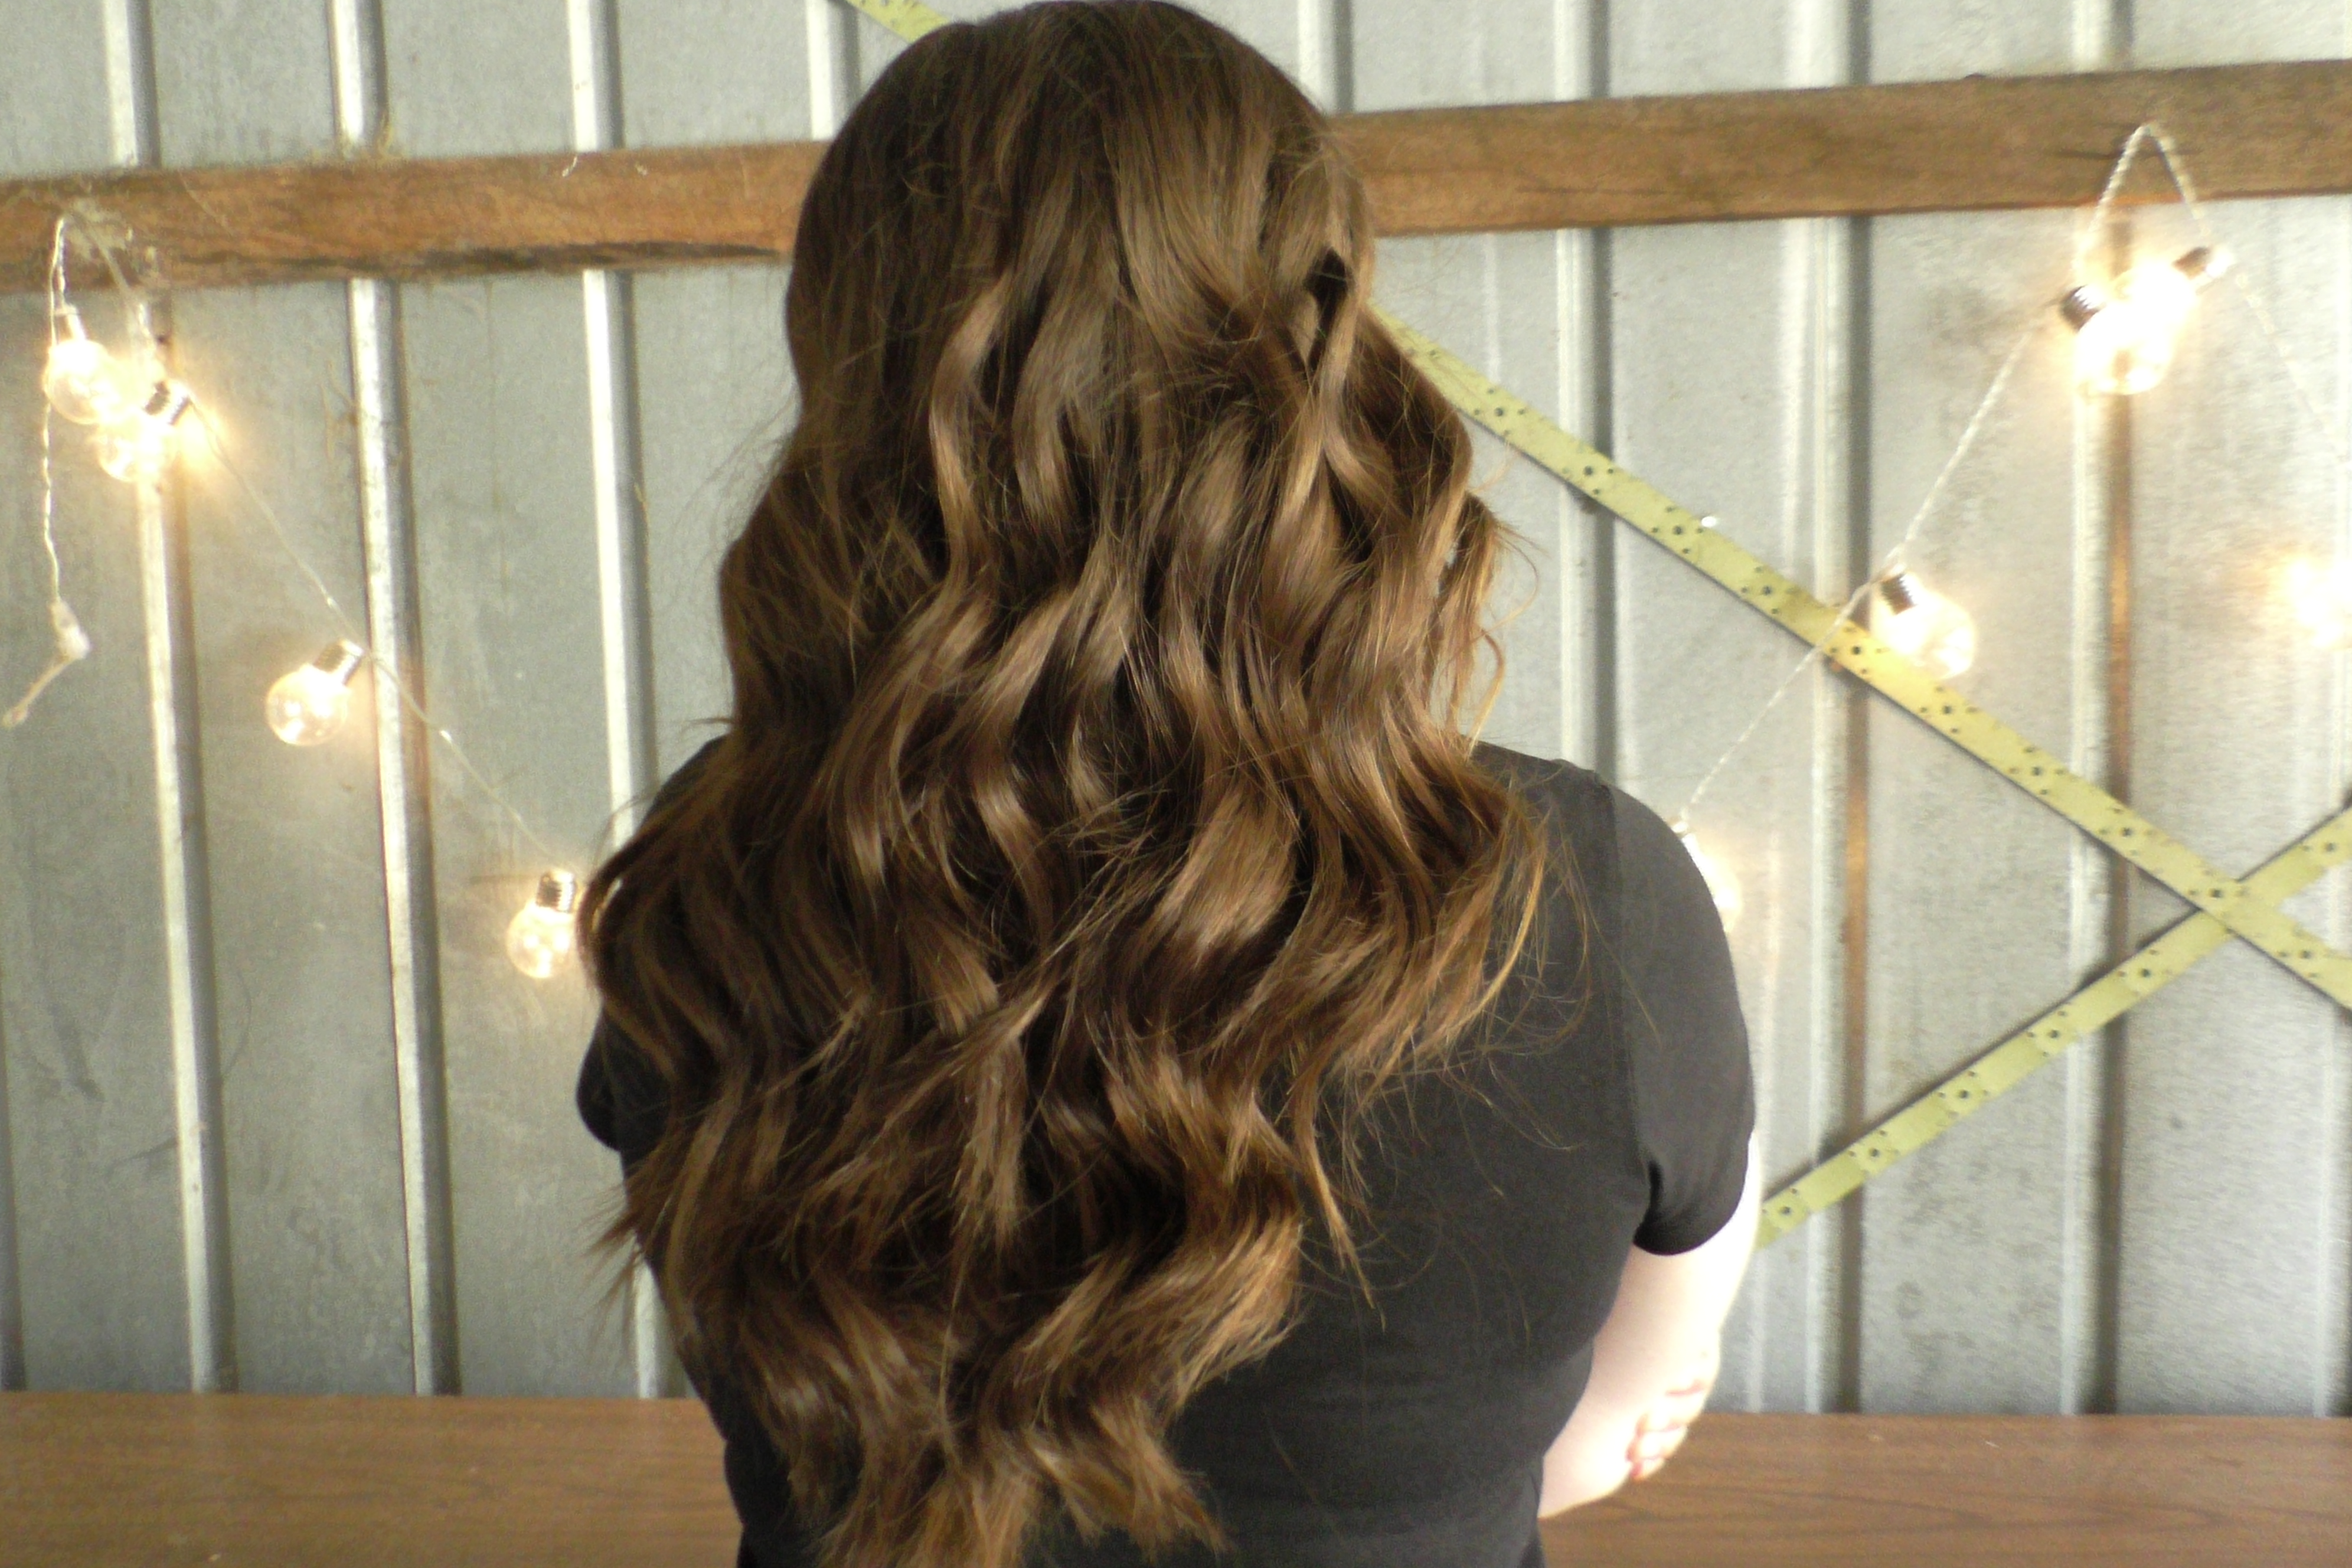 Video: babyliss curl secret hair styler tutorial – blushbeauty.